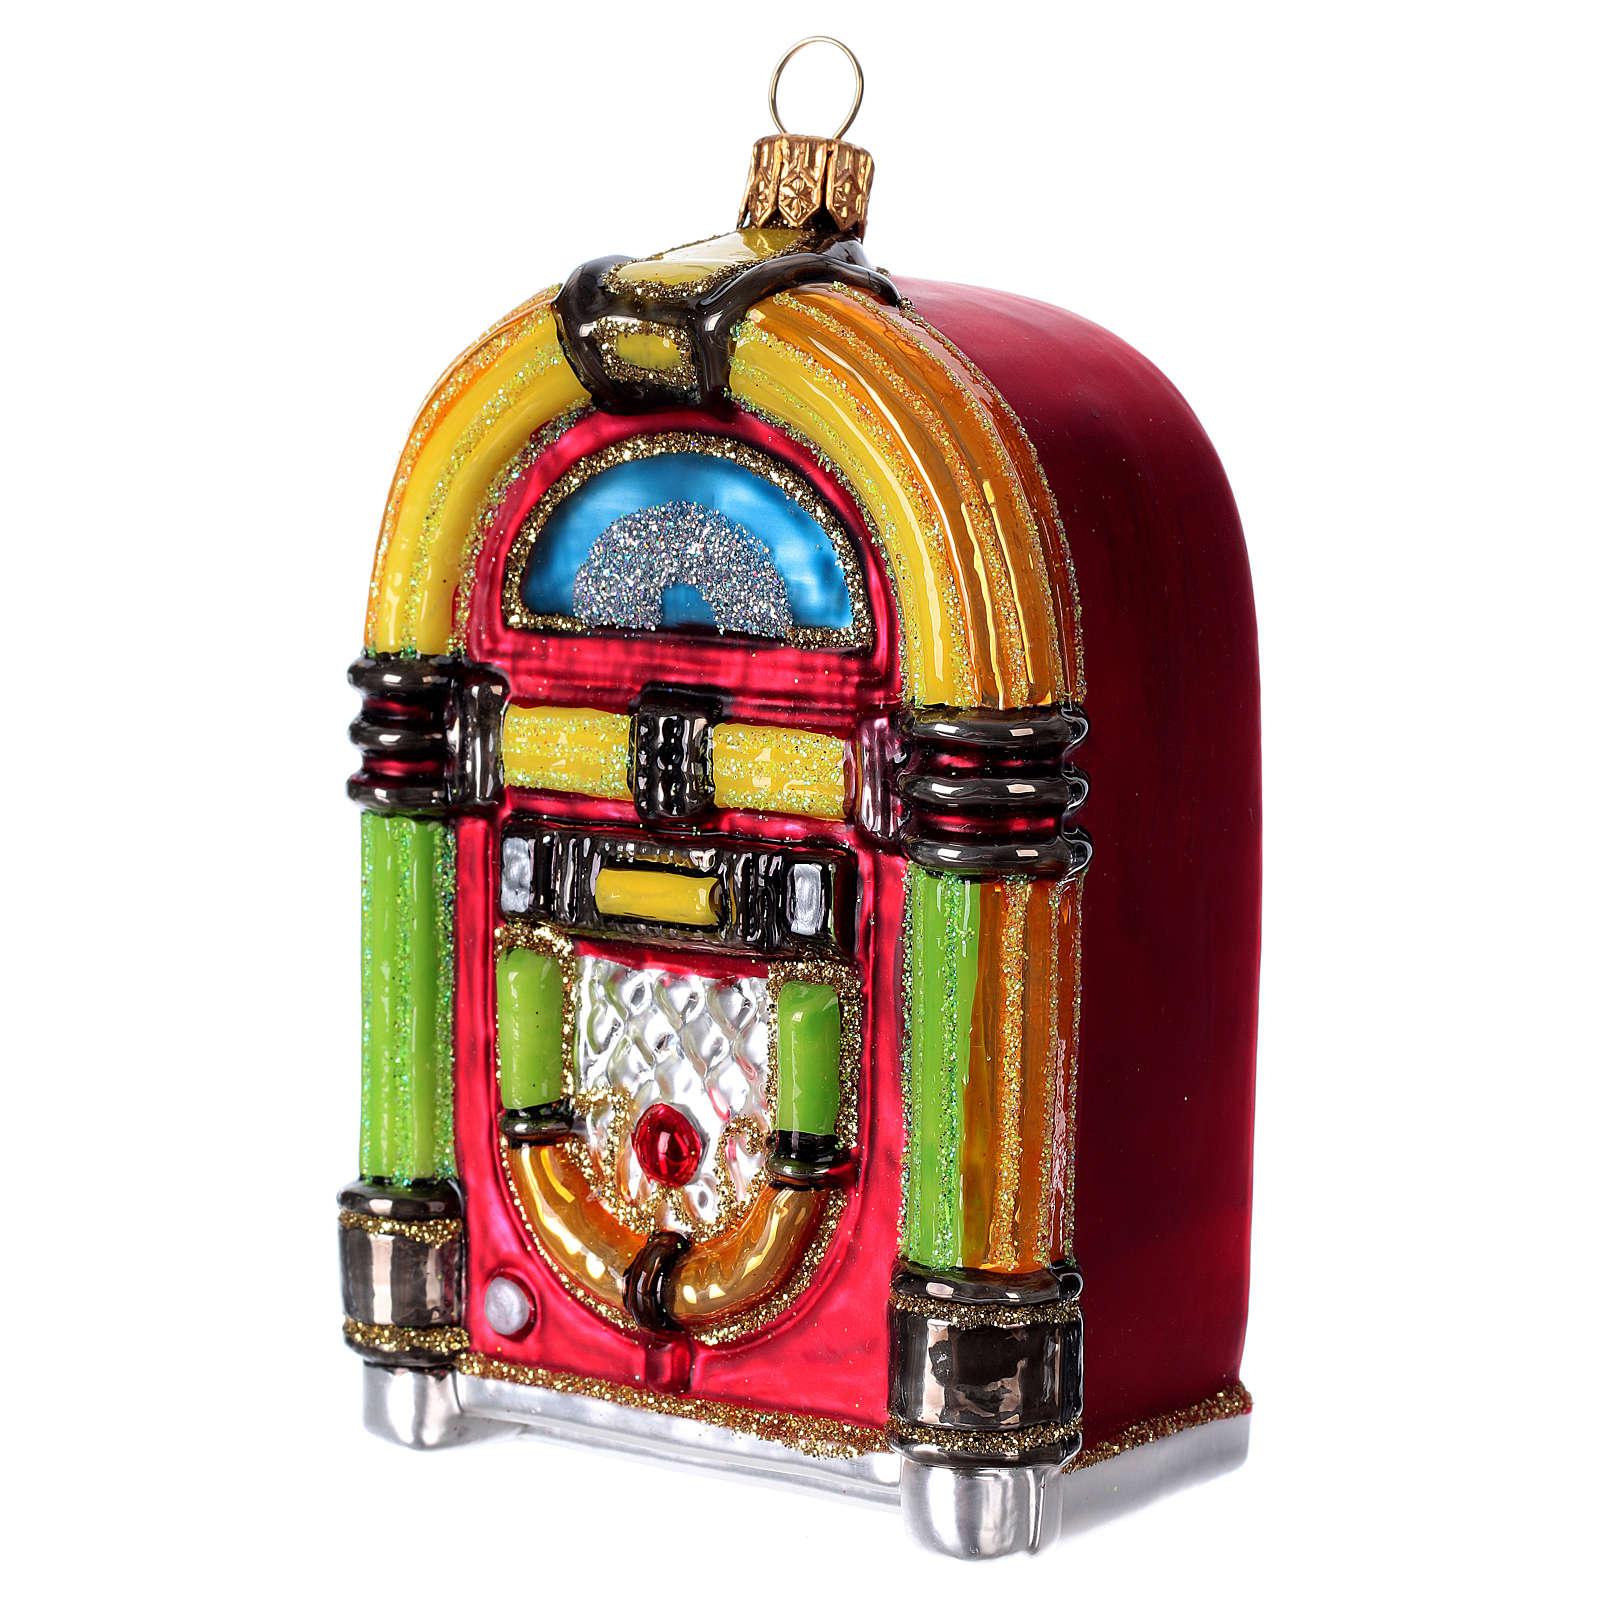 Jukebox, blown glass Christmas ornament 4